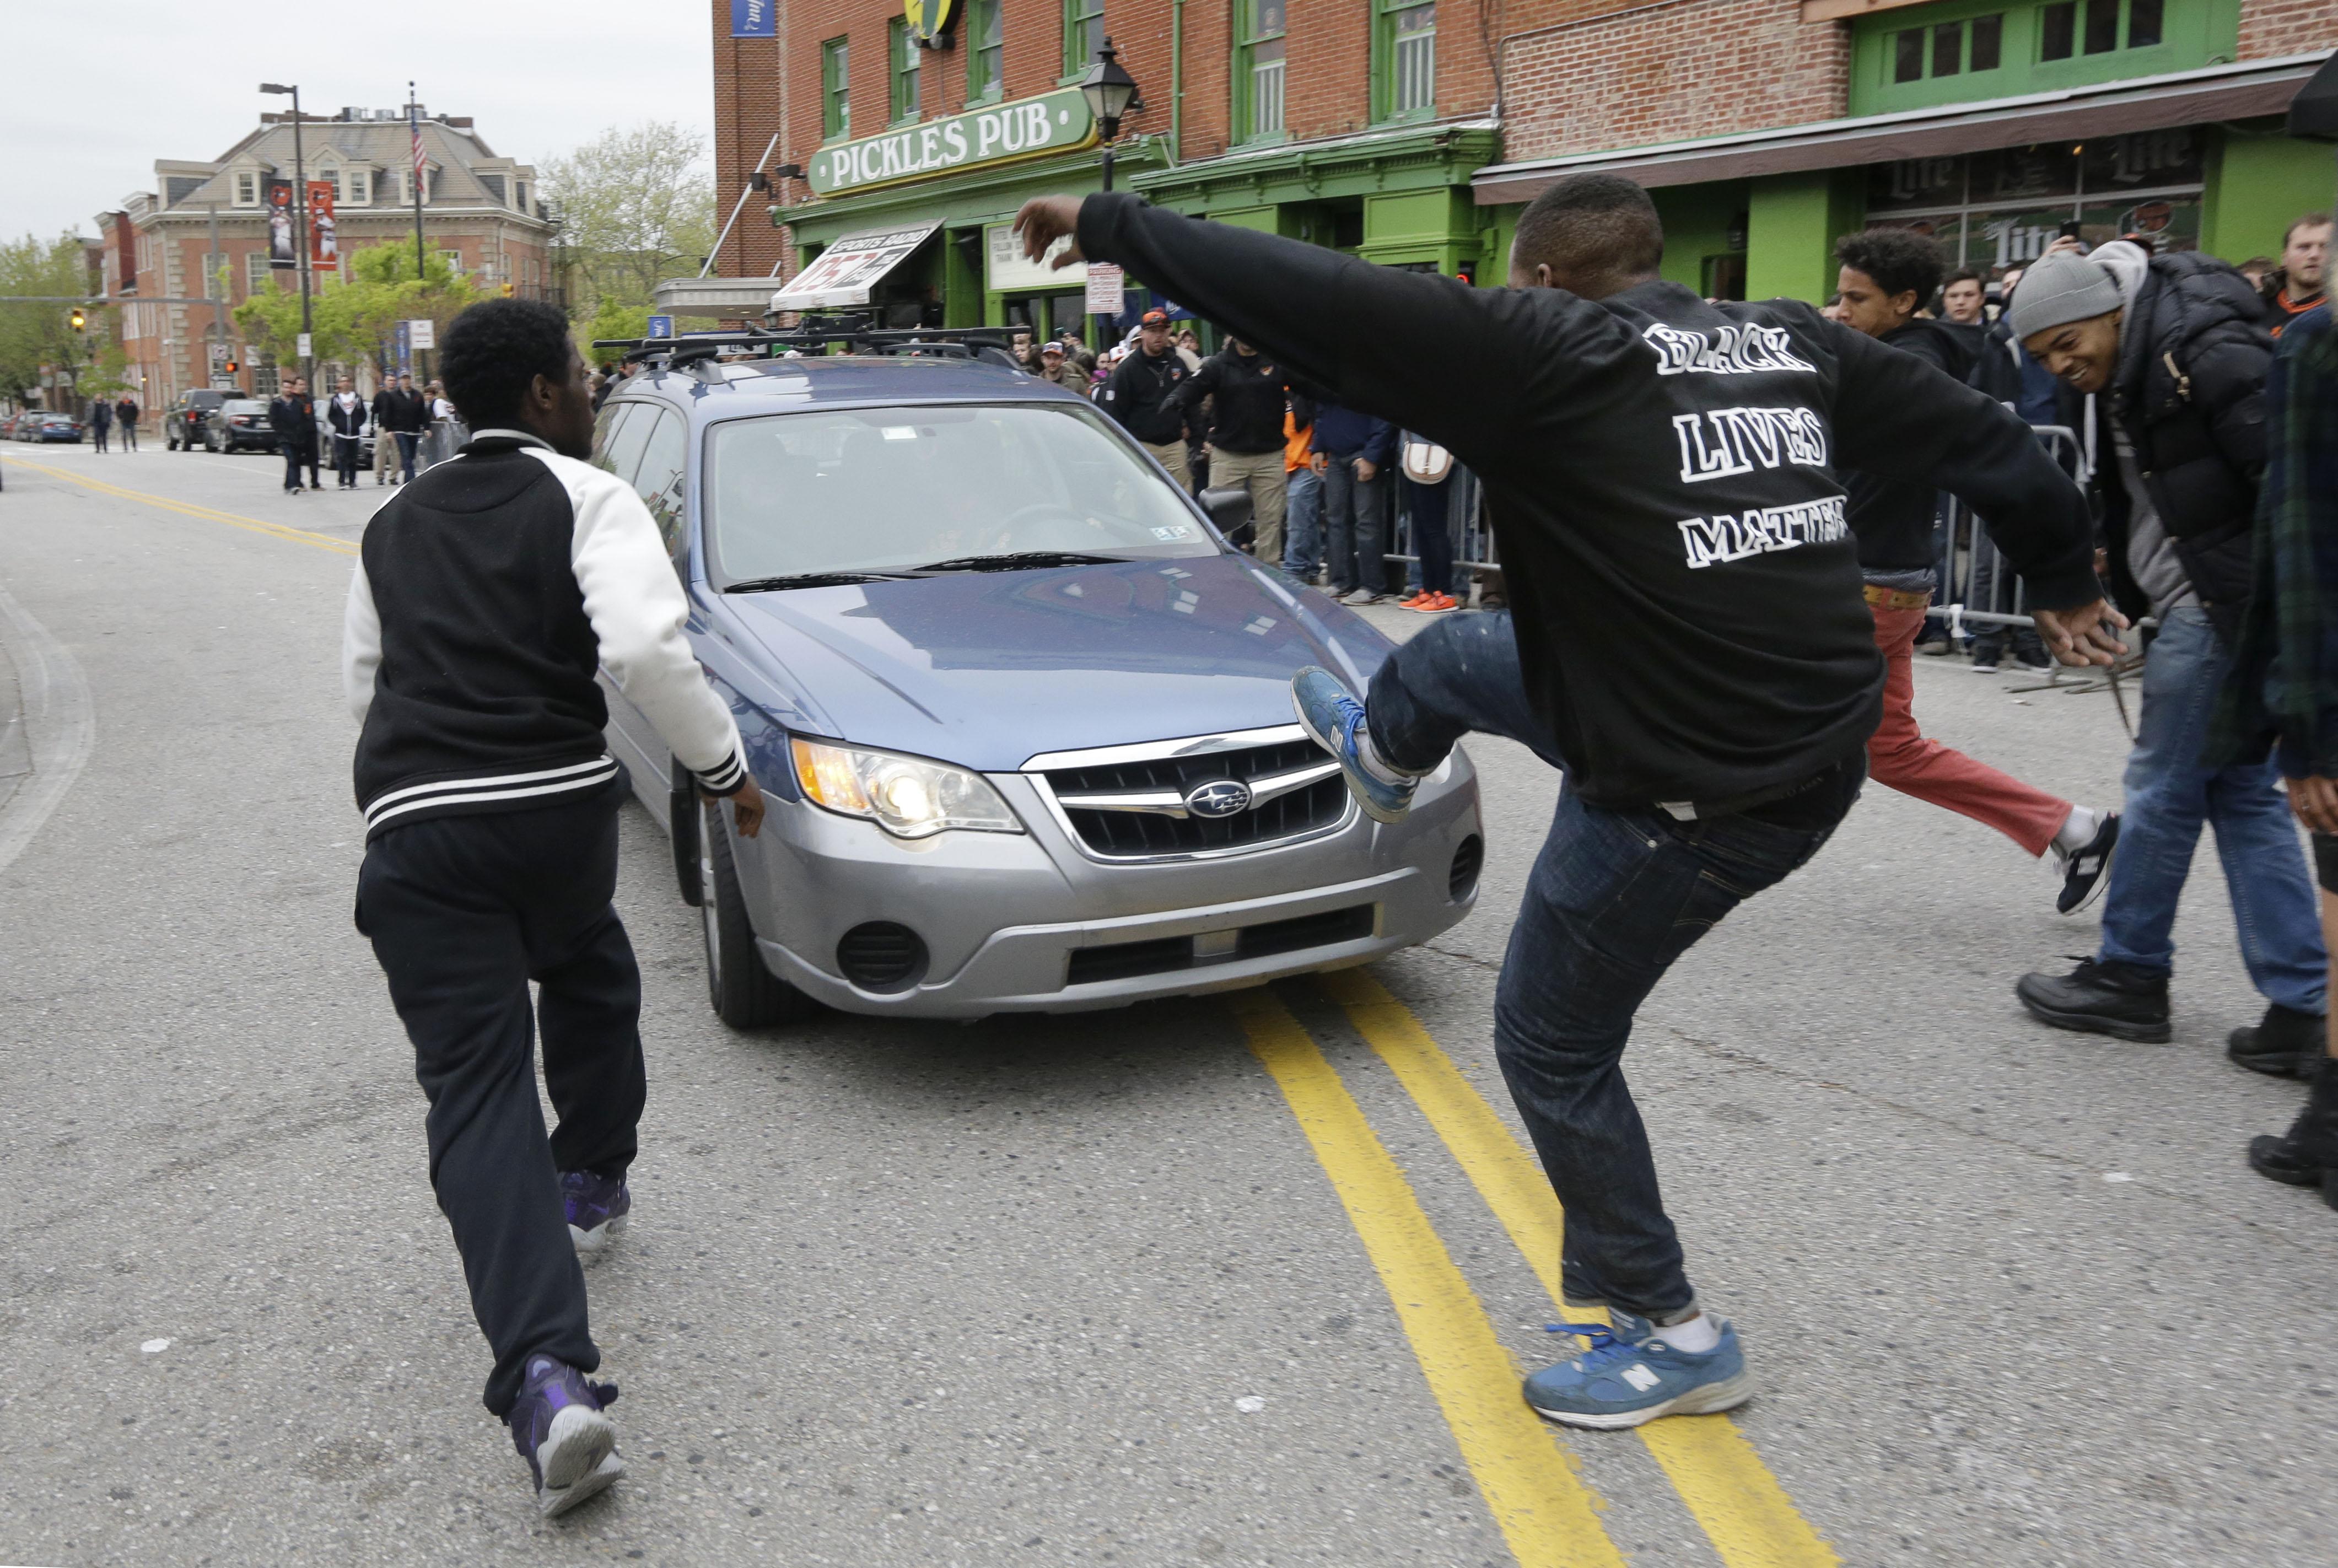 Https 2013 07 12 Justice Gallery Serial Killers Indexhtml Hello Nuku Panama Brown Wedges Cokelat Tua 36 150426173300 06 Baltimore Protests 0426